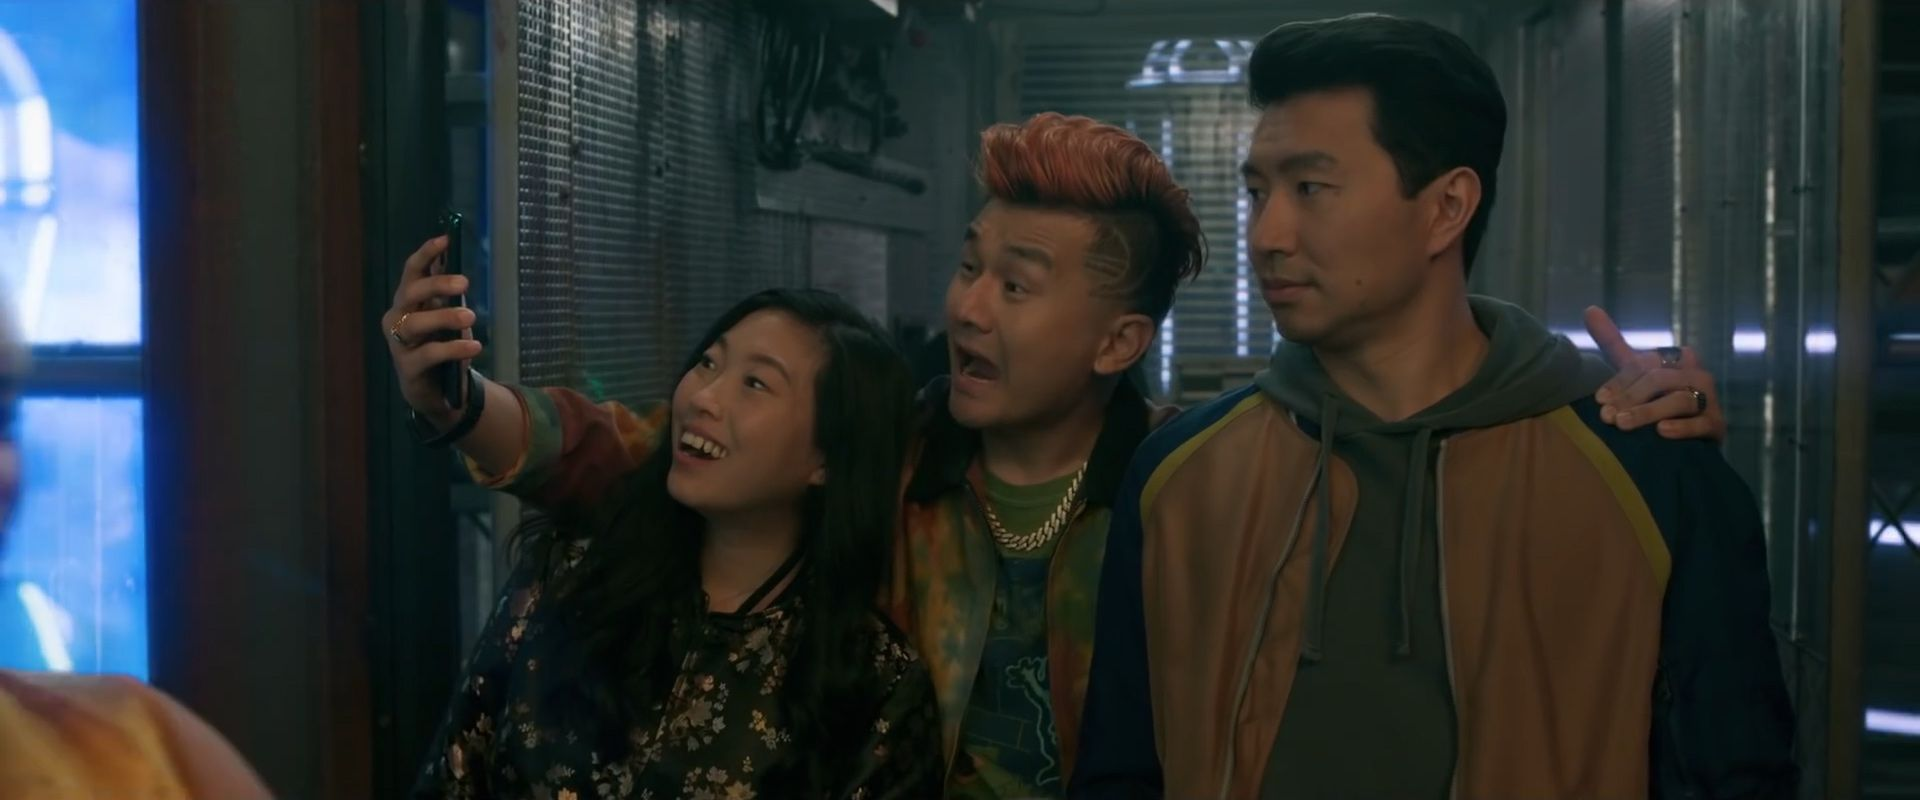 Shang-Chi Movie Images Show Simu Liu as the MCU's Next Superhero